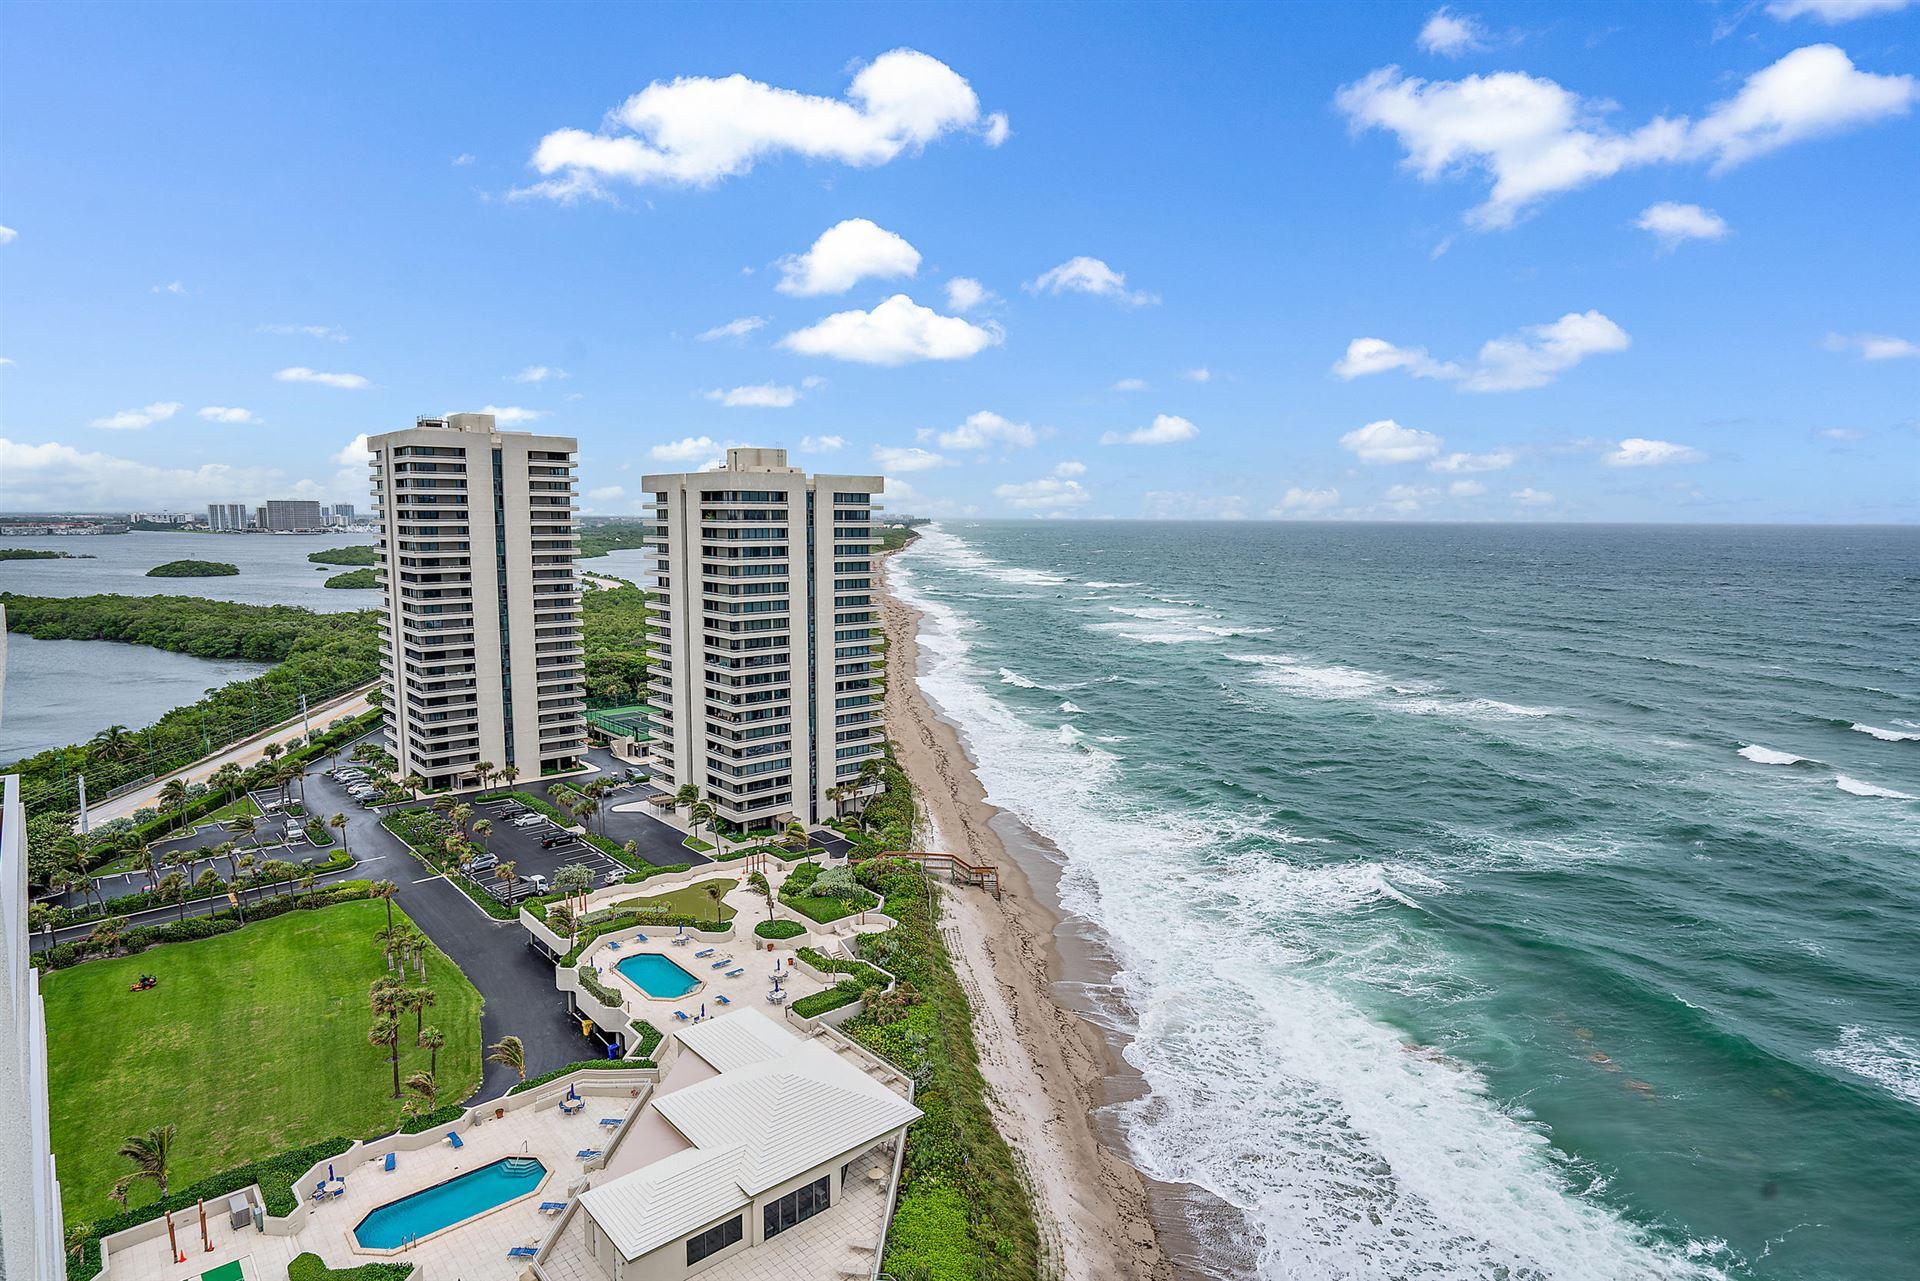 Photo of 5510 N Ocean Drive #19a, Singer Island, FL 33404 (MLS # RX-10665766)